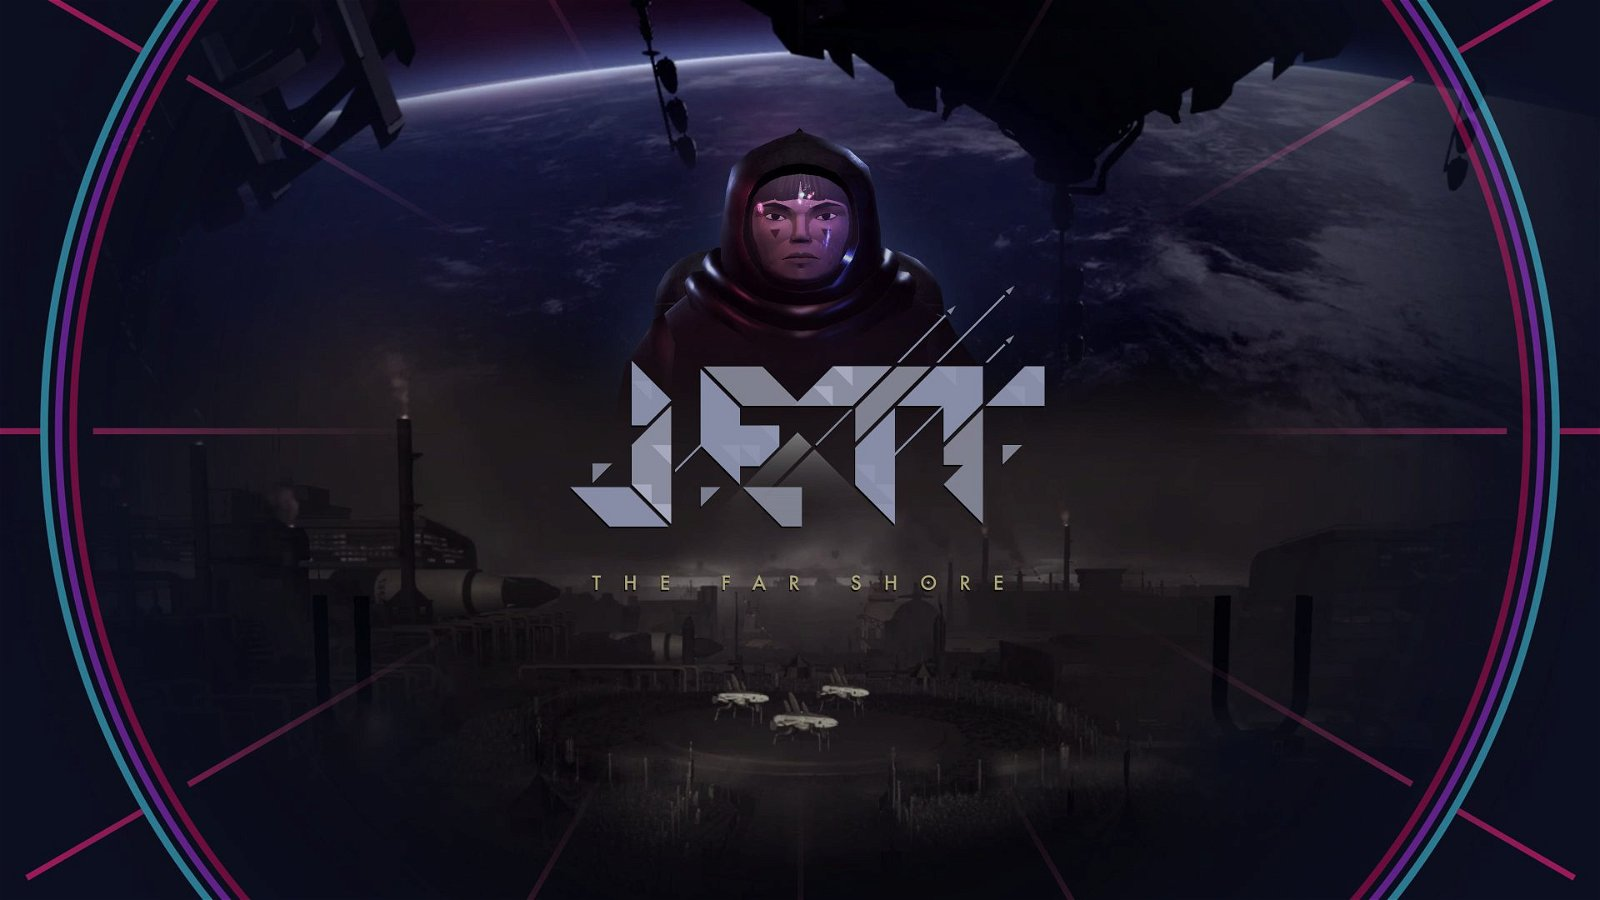 jett the far shore featured image